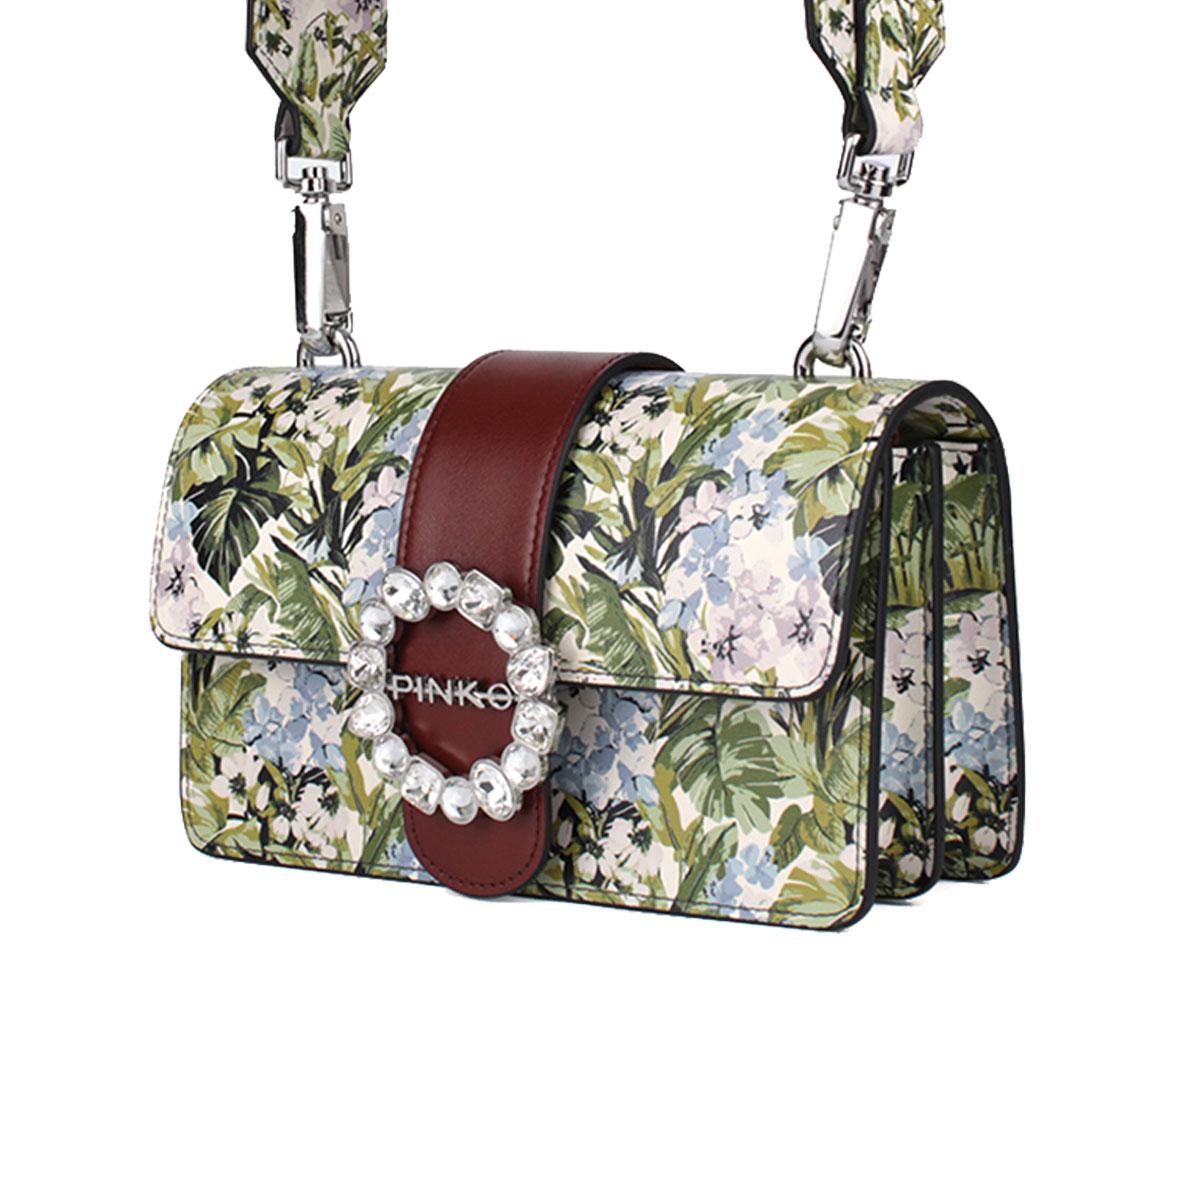 pinko品高新款女士绿色花卉图案单肩斜挎包燕子包1P212L Y4HQ